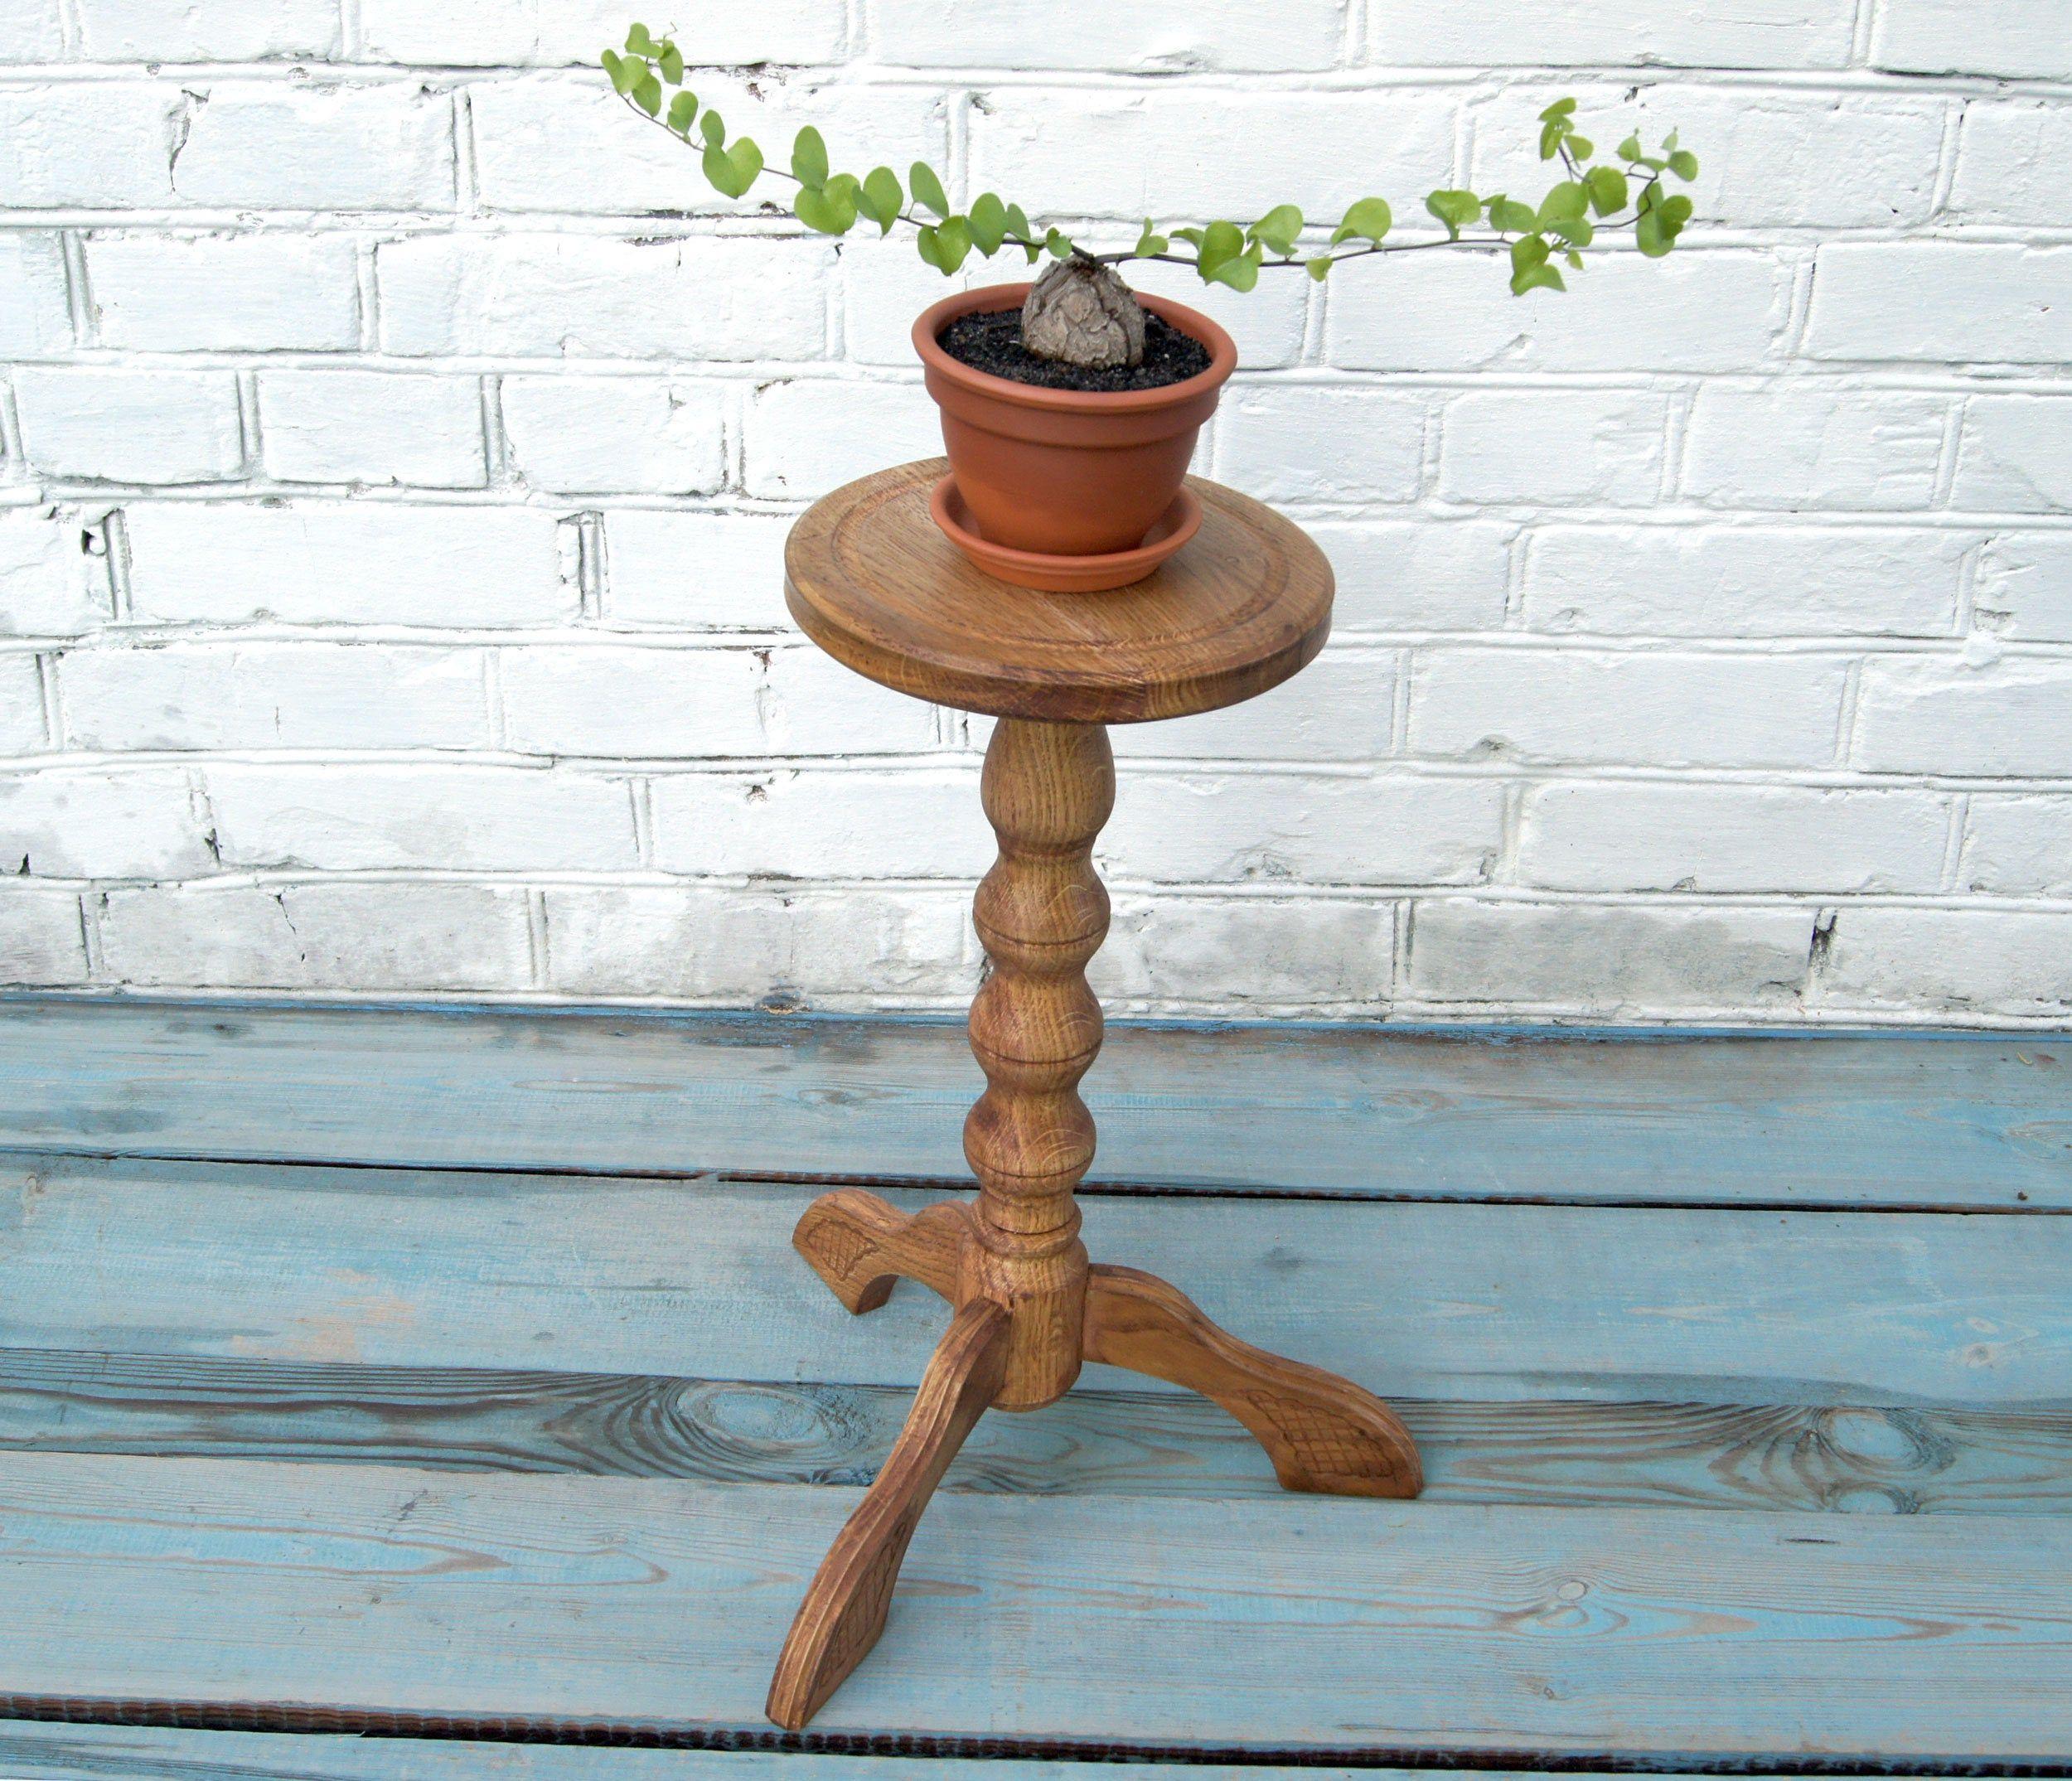 Wood Pedestal Plant Stand Indoor Wooden Planter Stand Flower Etsy Plant Stand Indoor Wooden Planters Plant Pot Holders